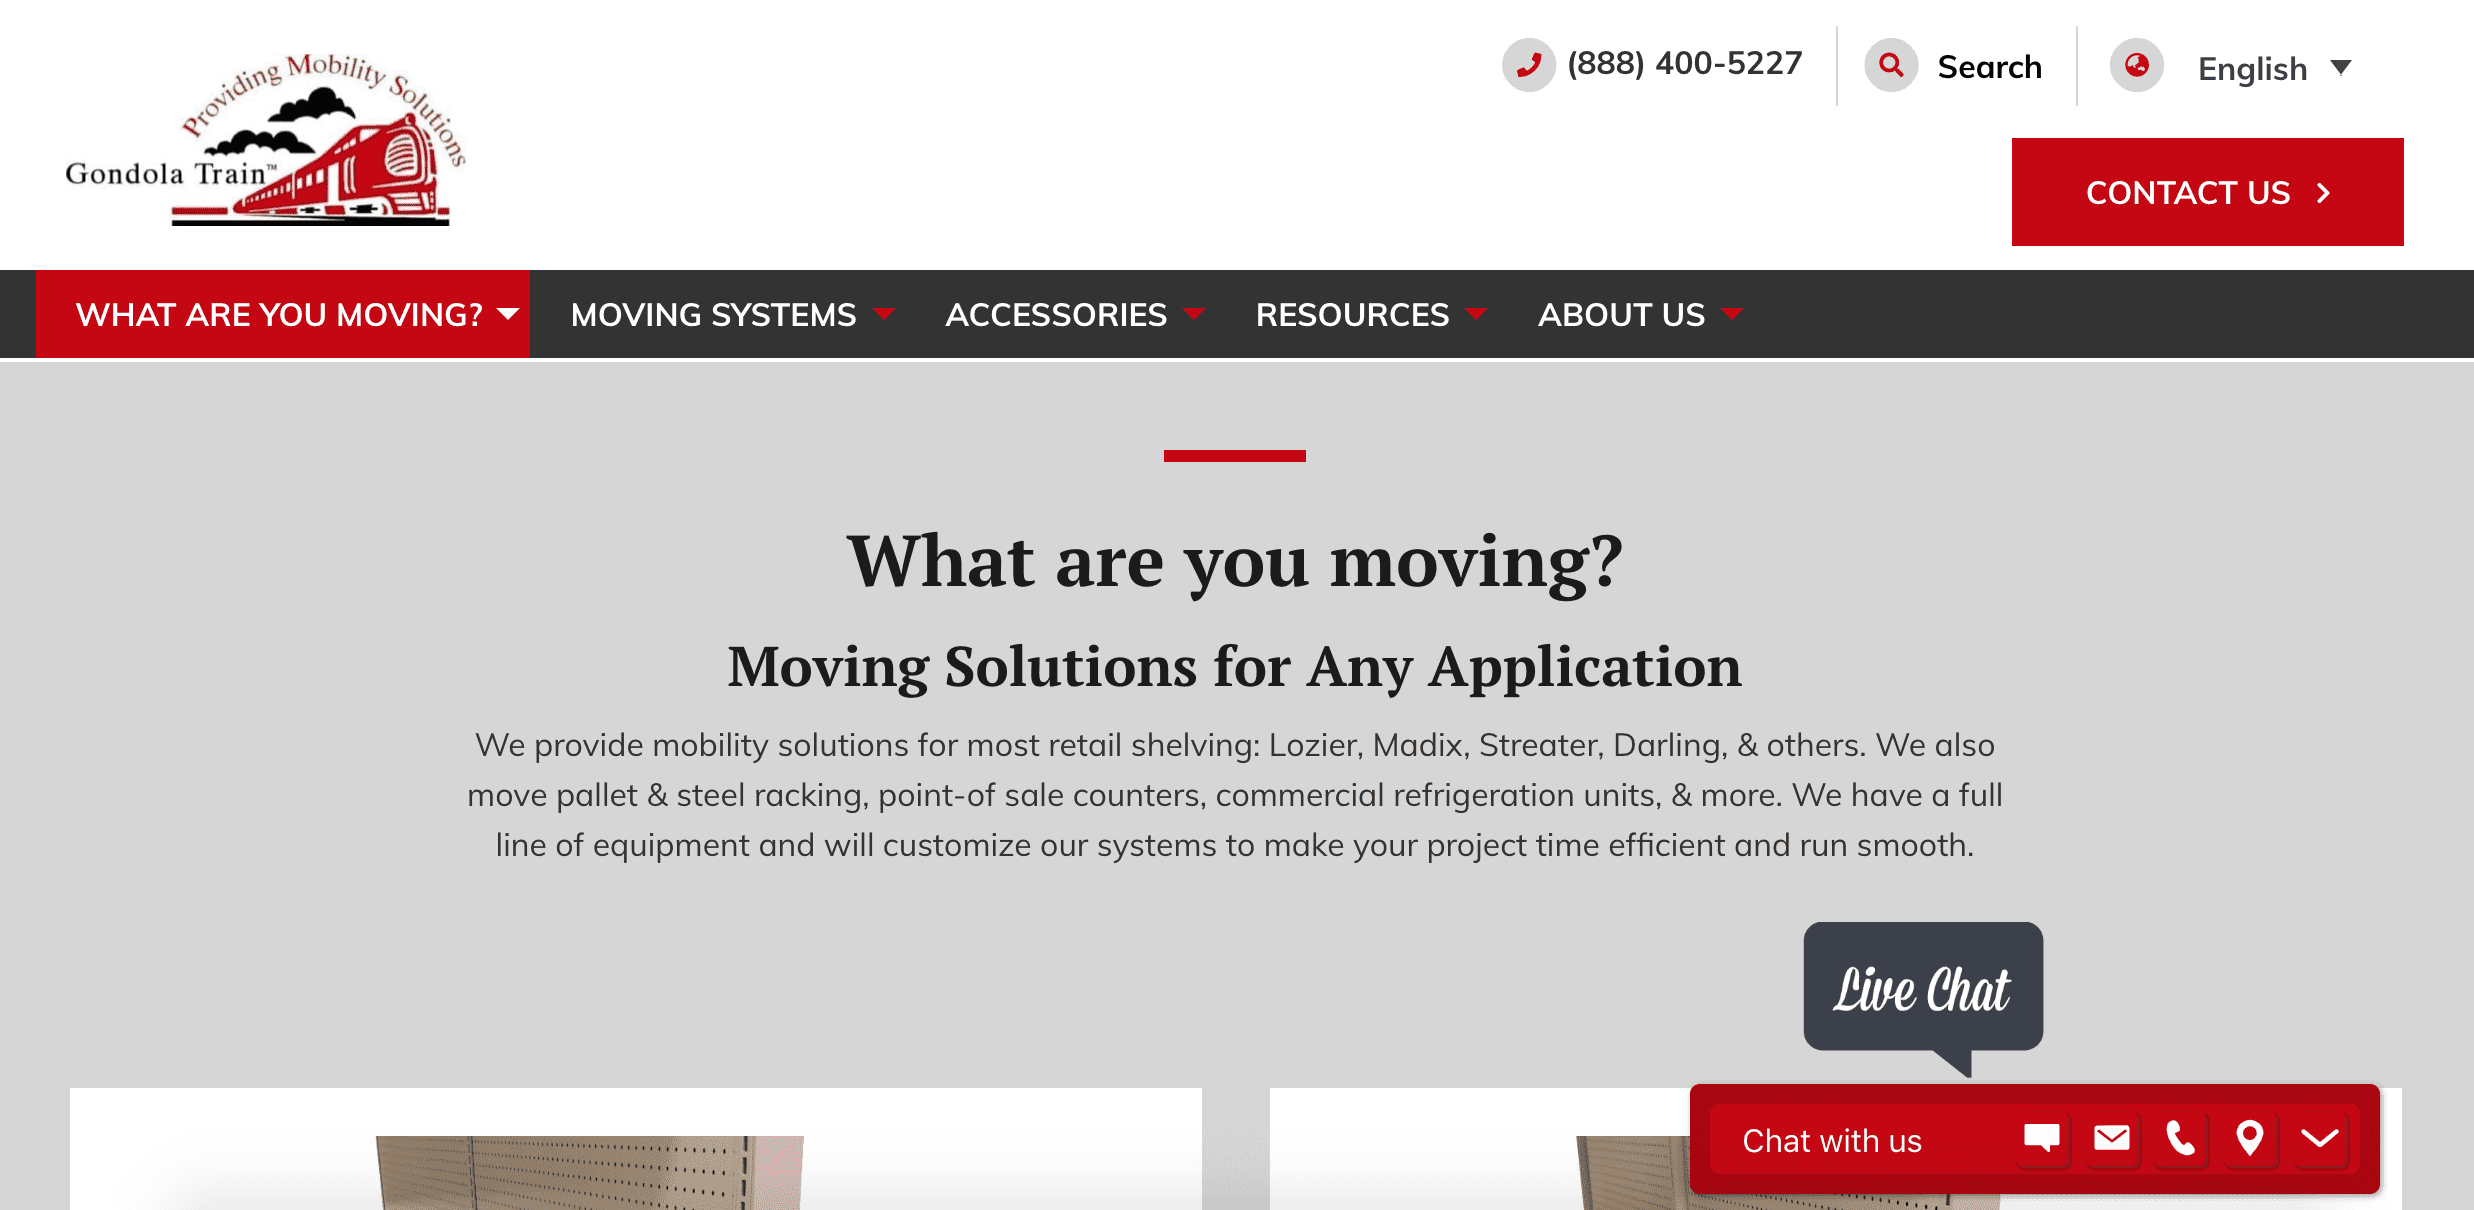 Gondola Train Moving Systems webpage